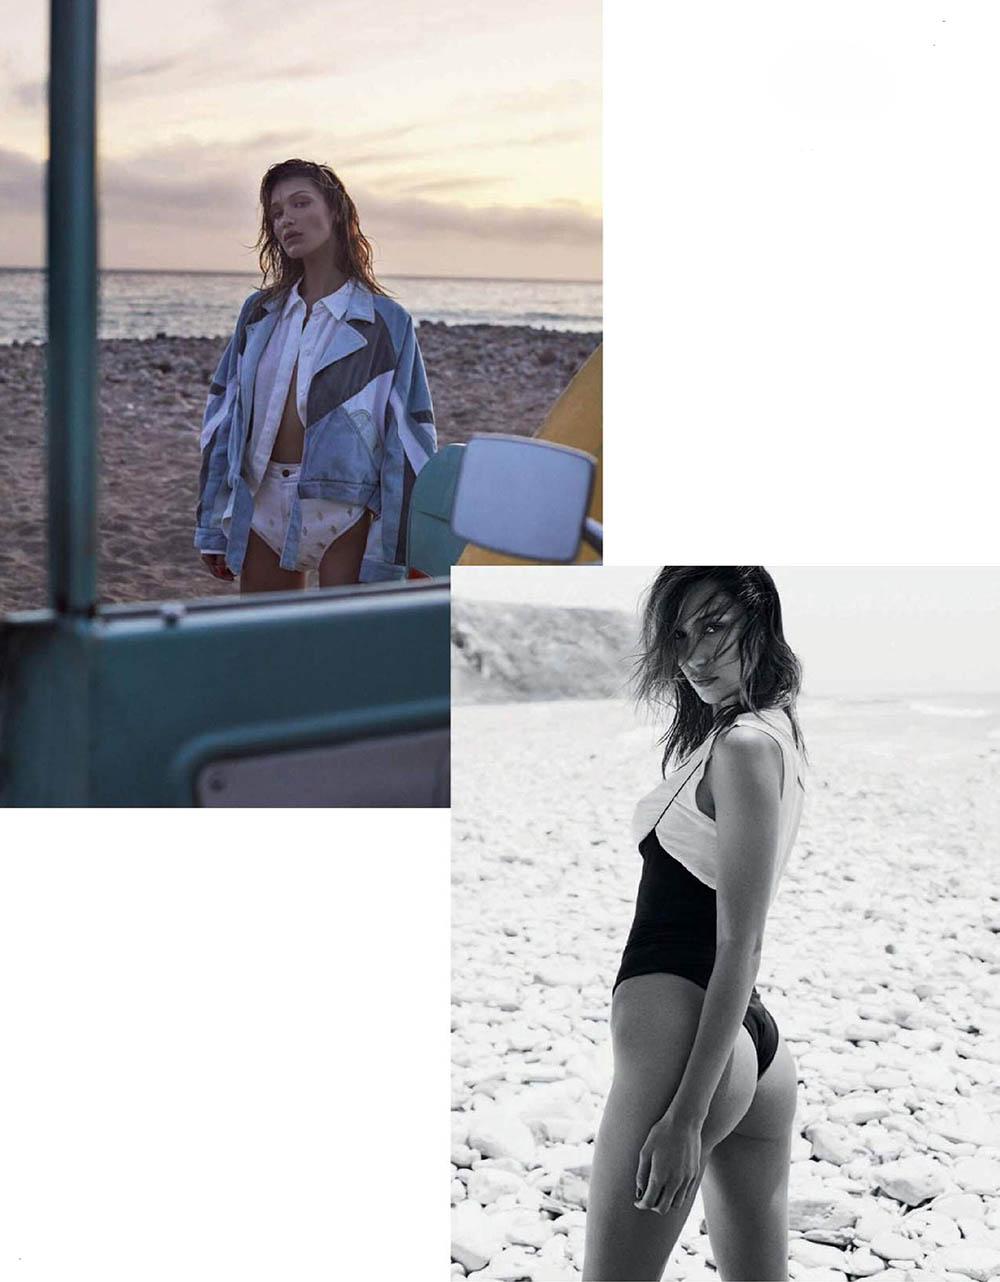 Bella Hadid covers Vogue Spain June 2019 by Zoey Grossman